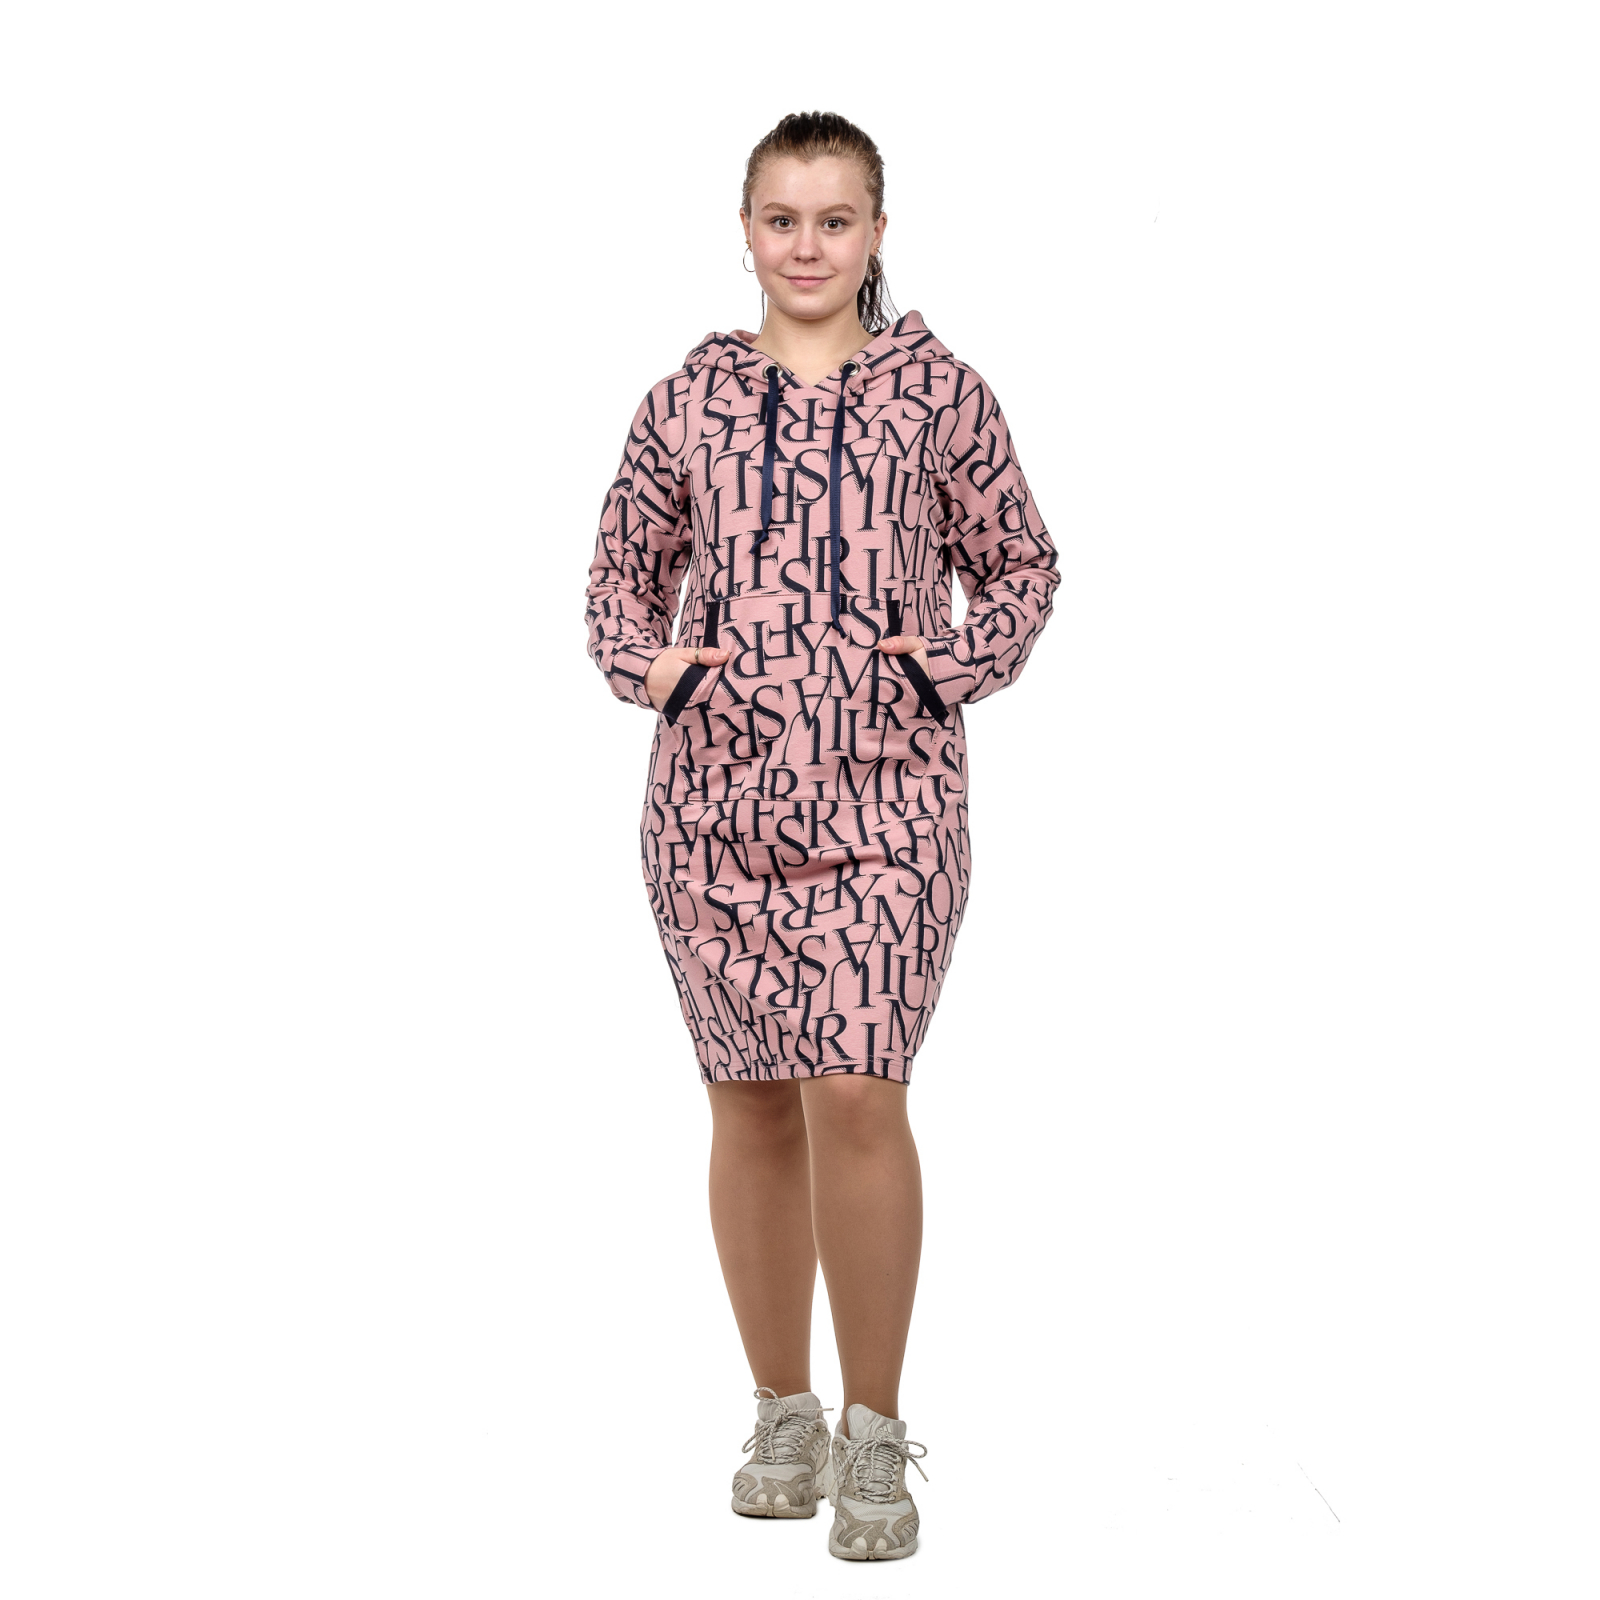 Платье (розовая пудра) Буквы (футер) с капюшоном М-0159Р